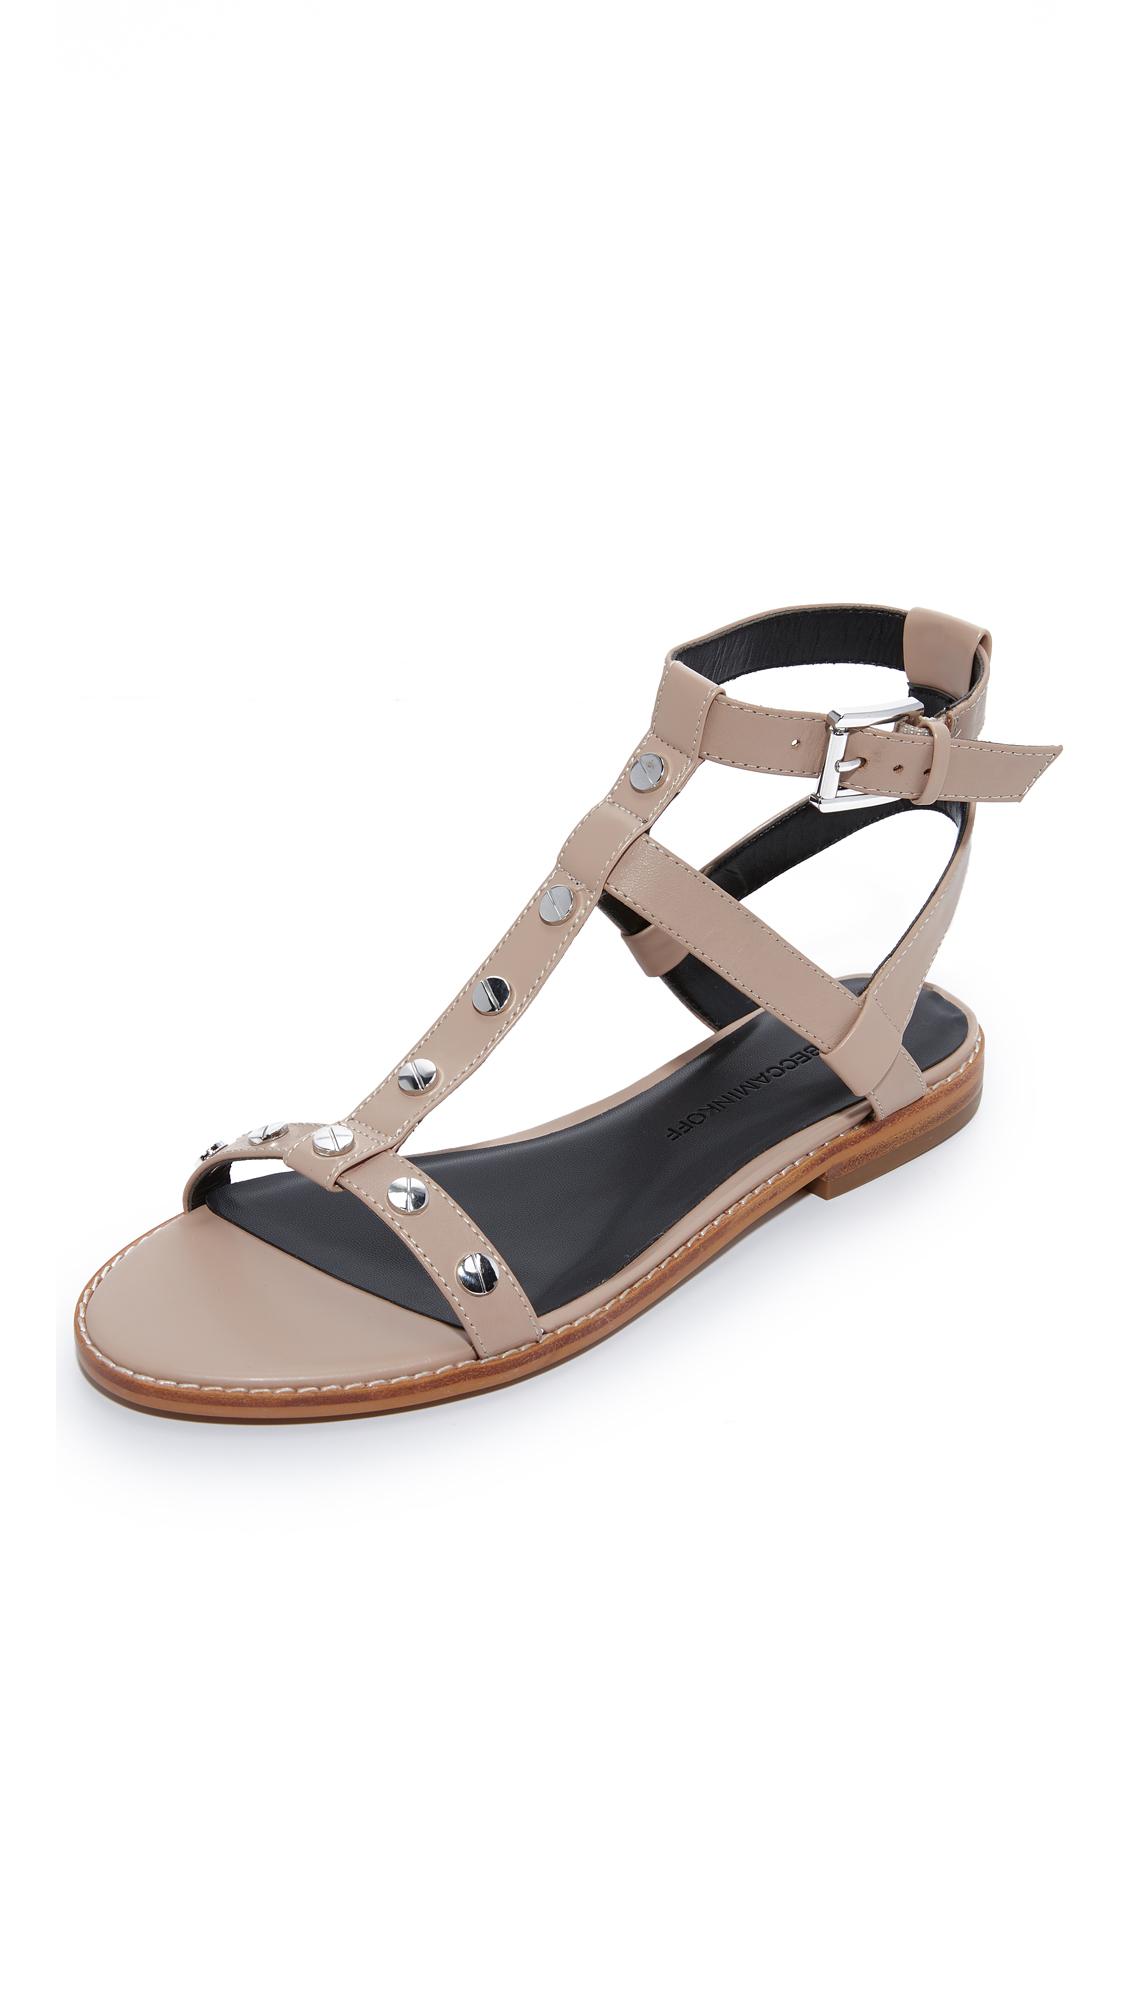 Sandals online shopping